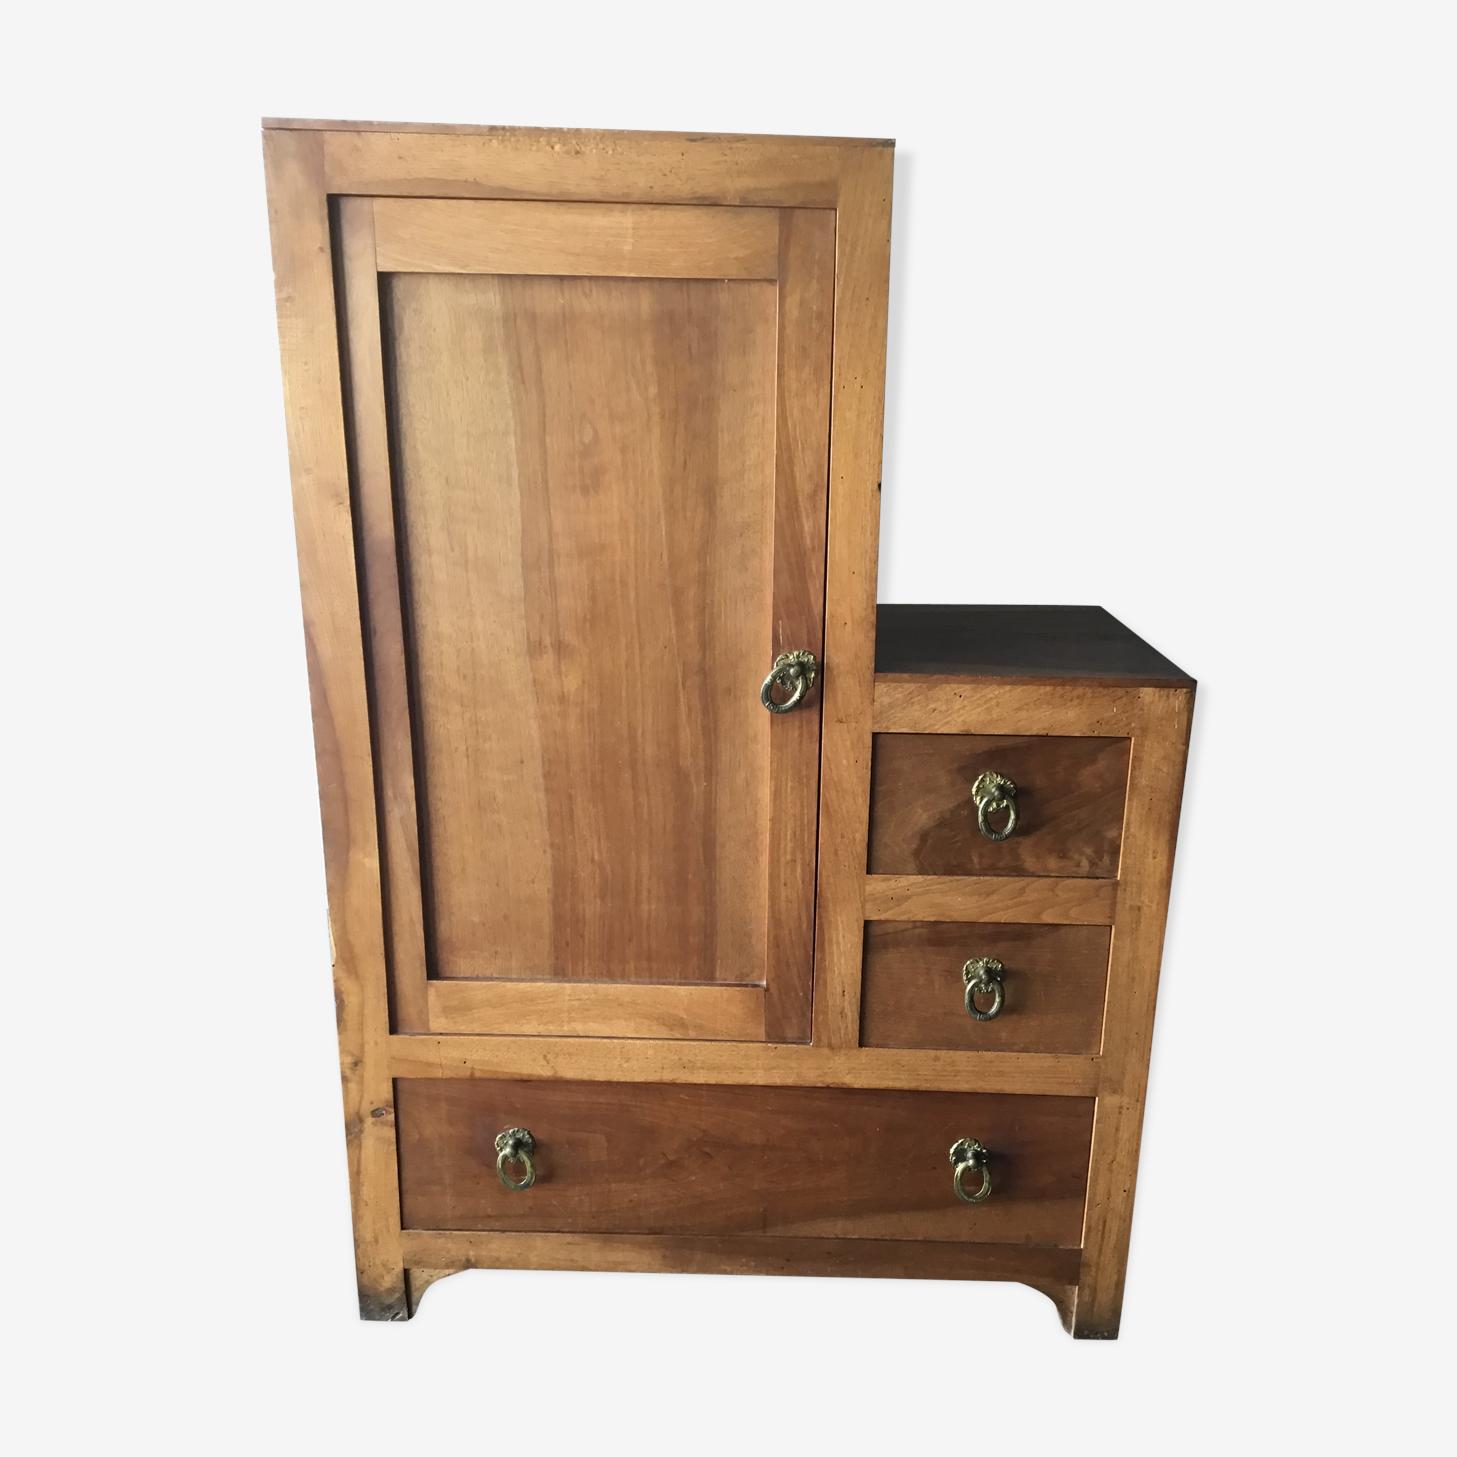 Asymmetric dresser